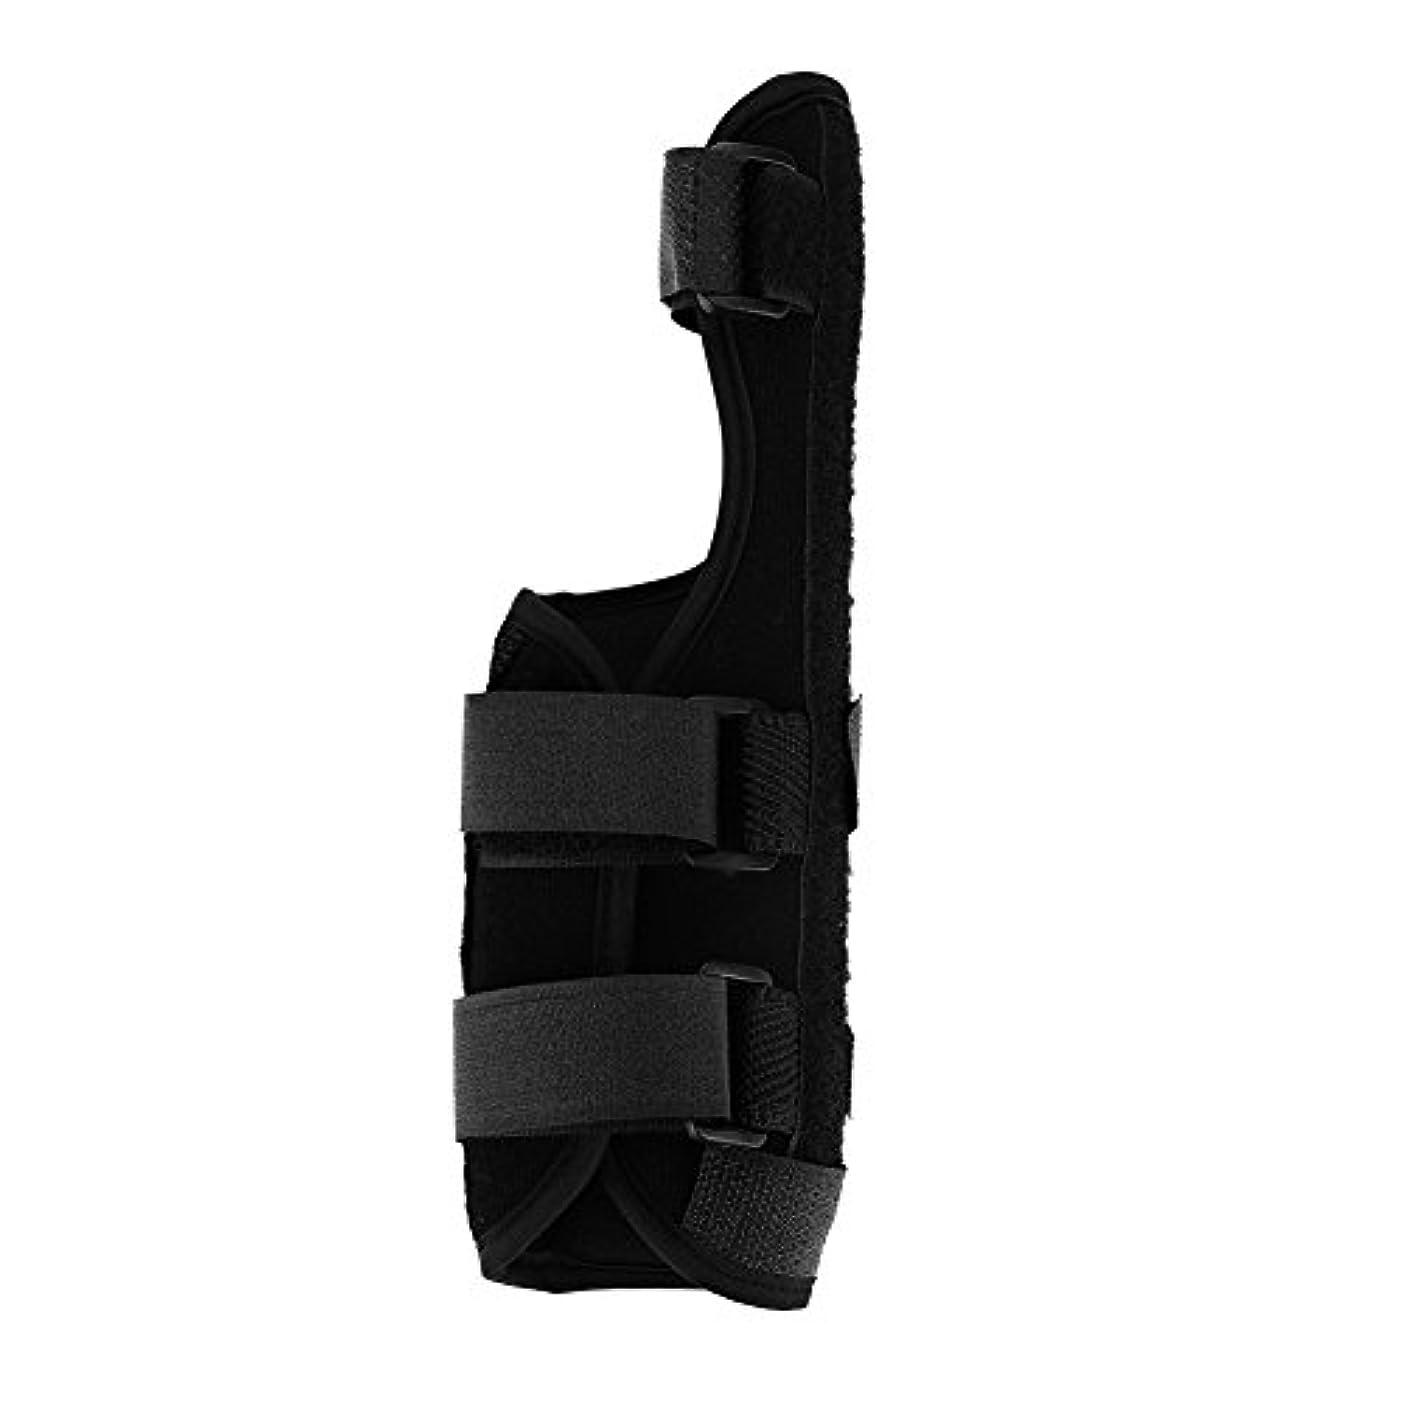 脚本登場狐高度な手首ブレース - 手根管手首副子。手根管症候群、手首の痛み、捻挫、RSI、関節炎の即時鎮痛に最適(IzquierdaS)